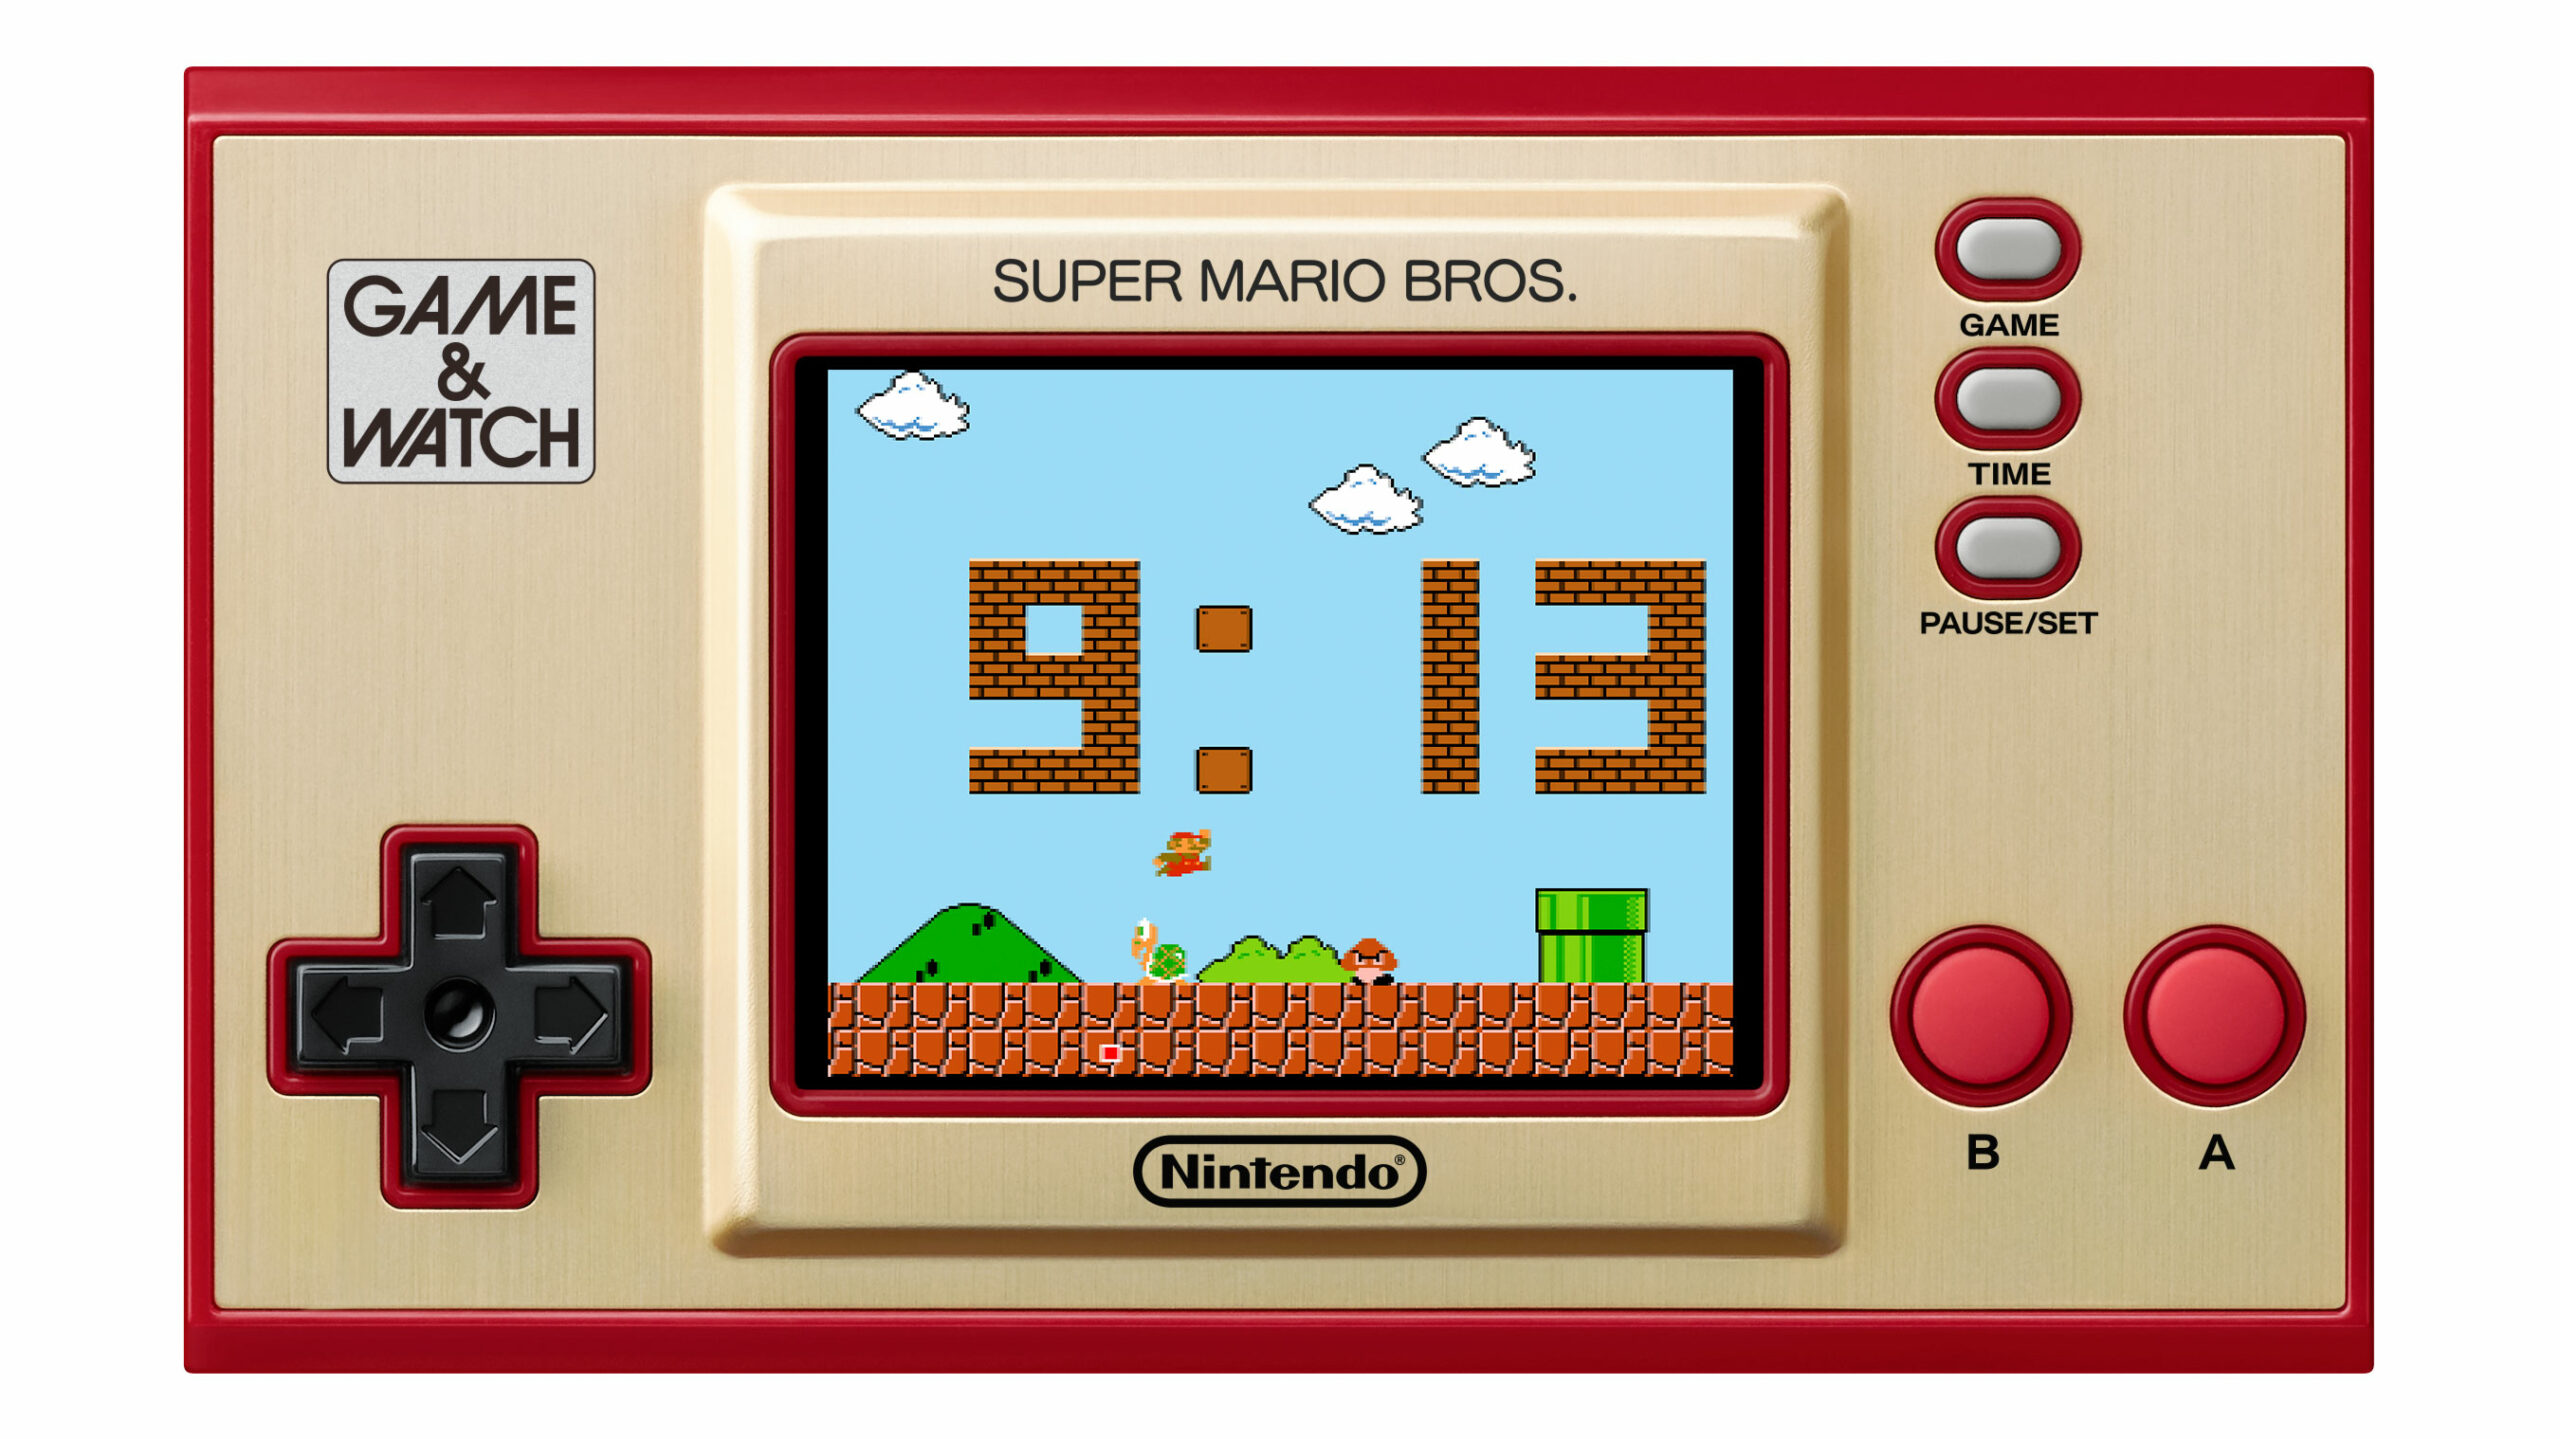 Nintendo Super Mario Bros. Game & Watch handheld